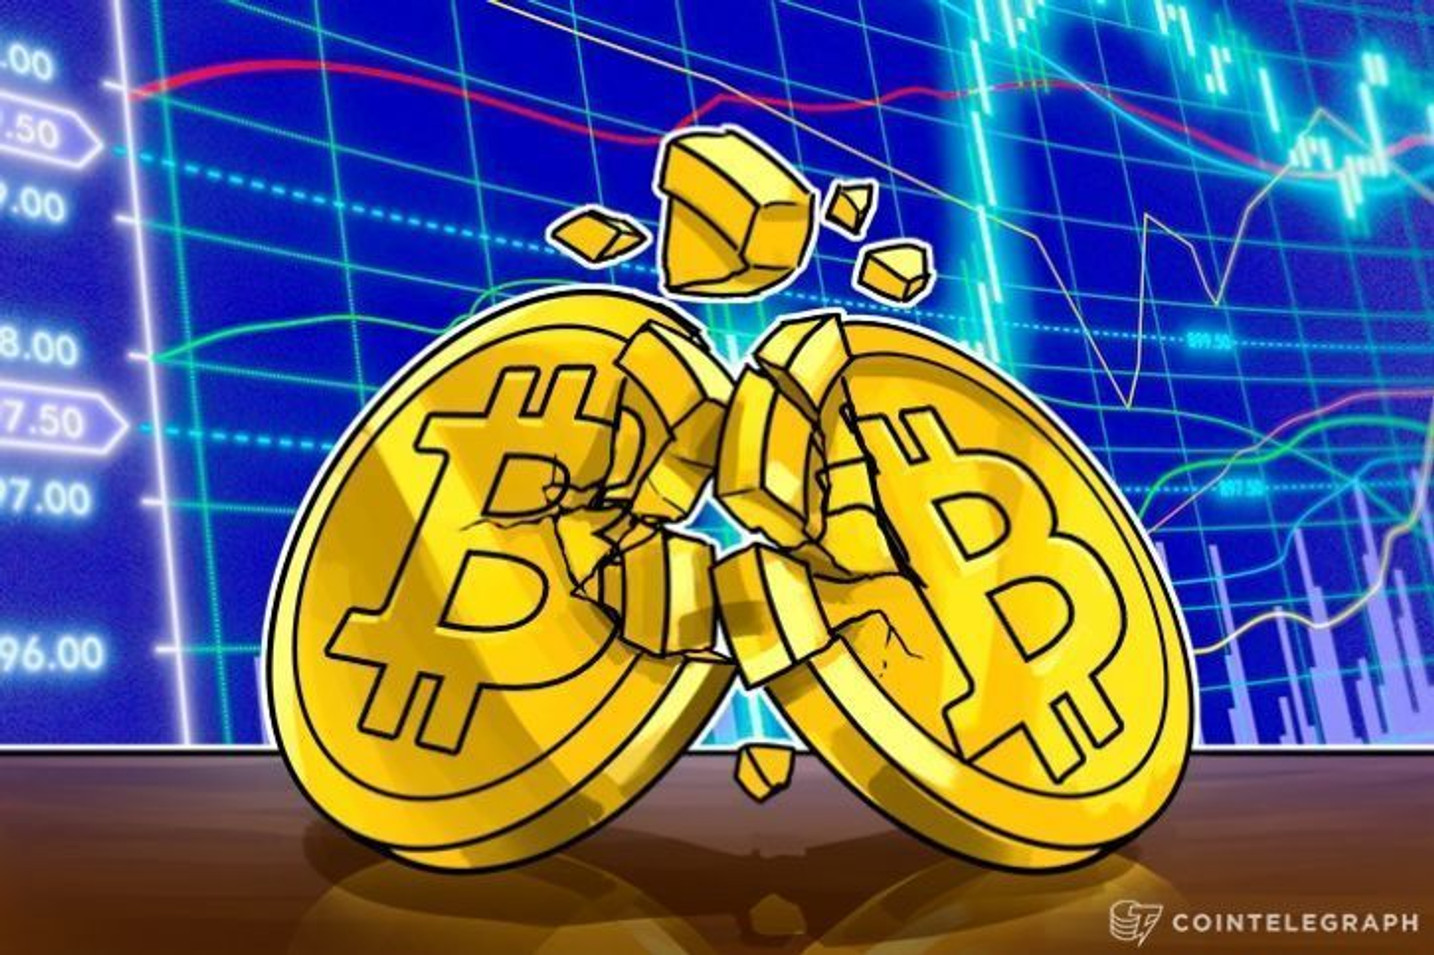 Dennis Gartman Still Won't Buy Bitcoin, Scared